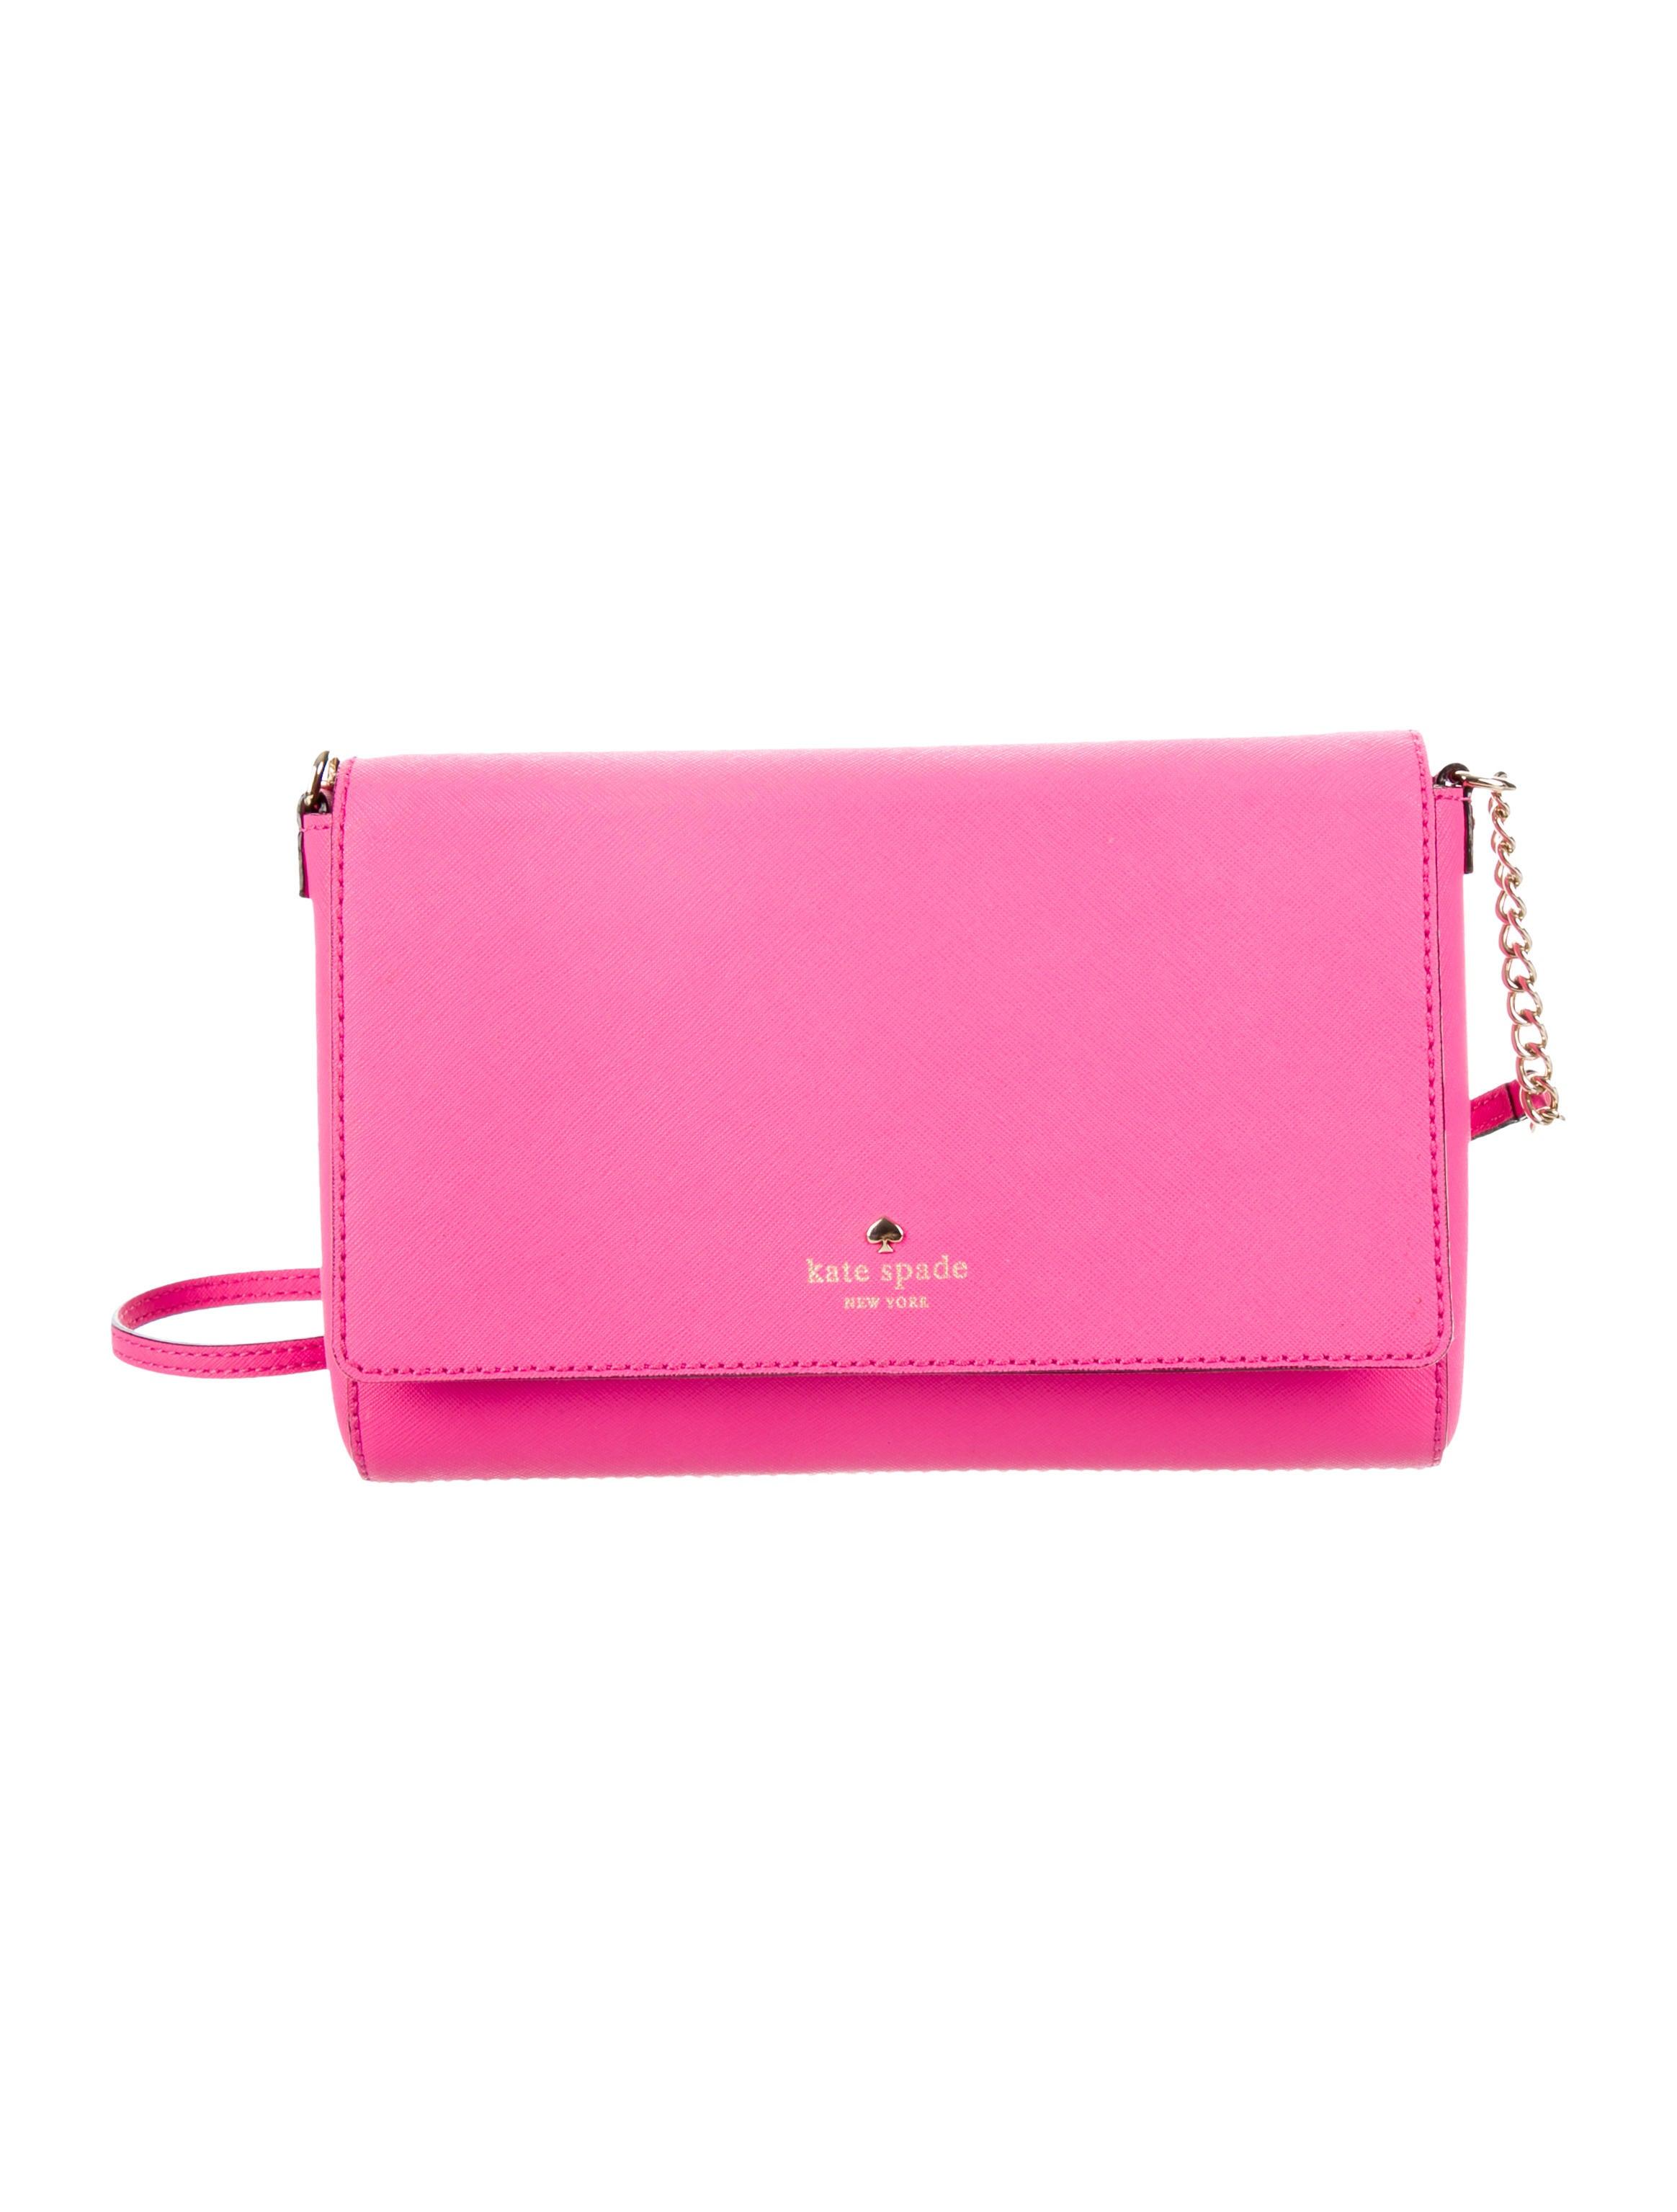 27e61dee09e Kate Spade New York Charlotte Street Alek Crossbody Bag - Handbags ...